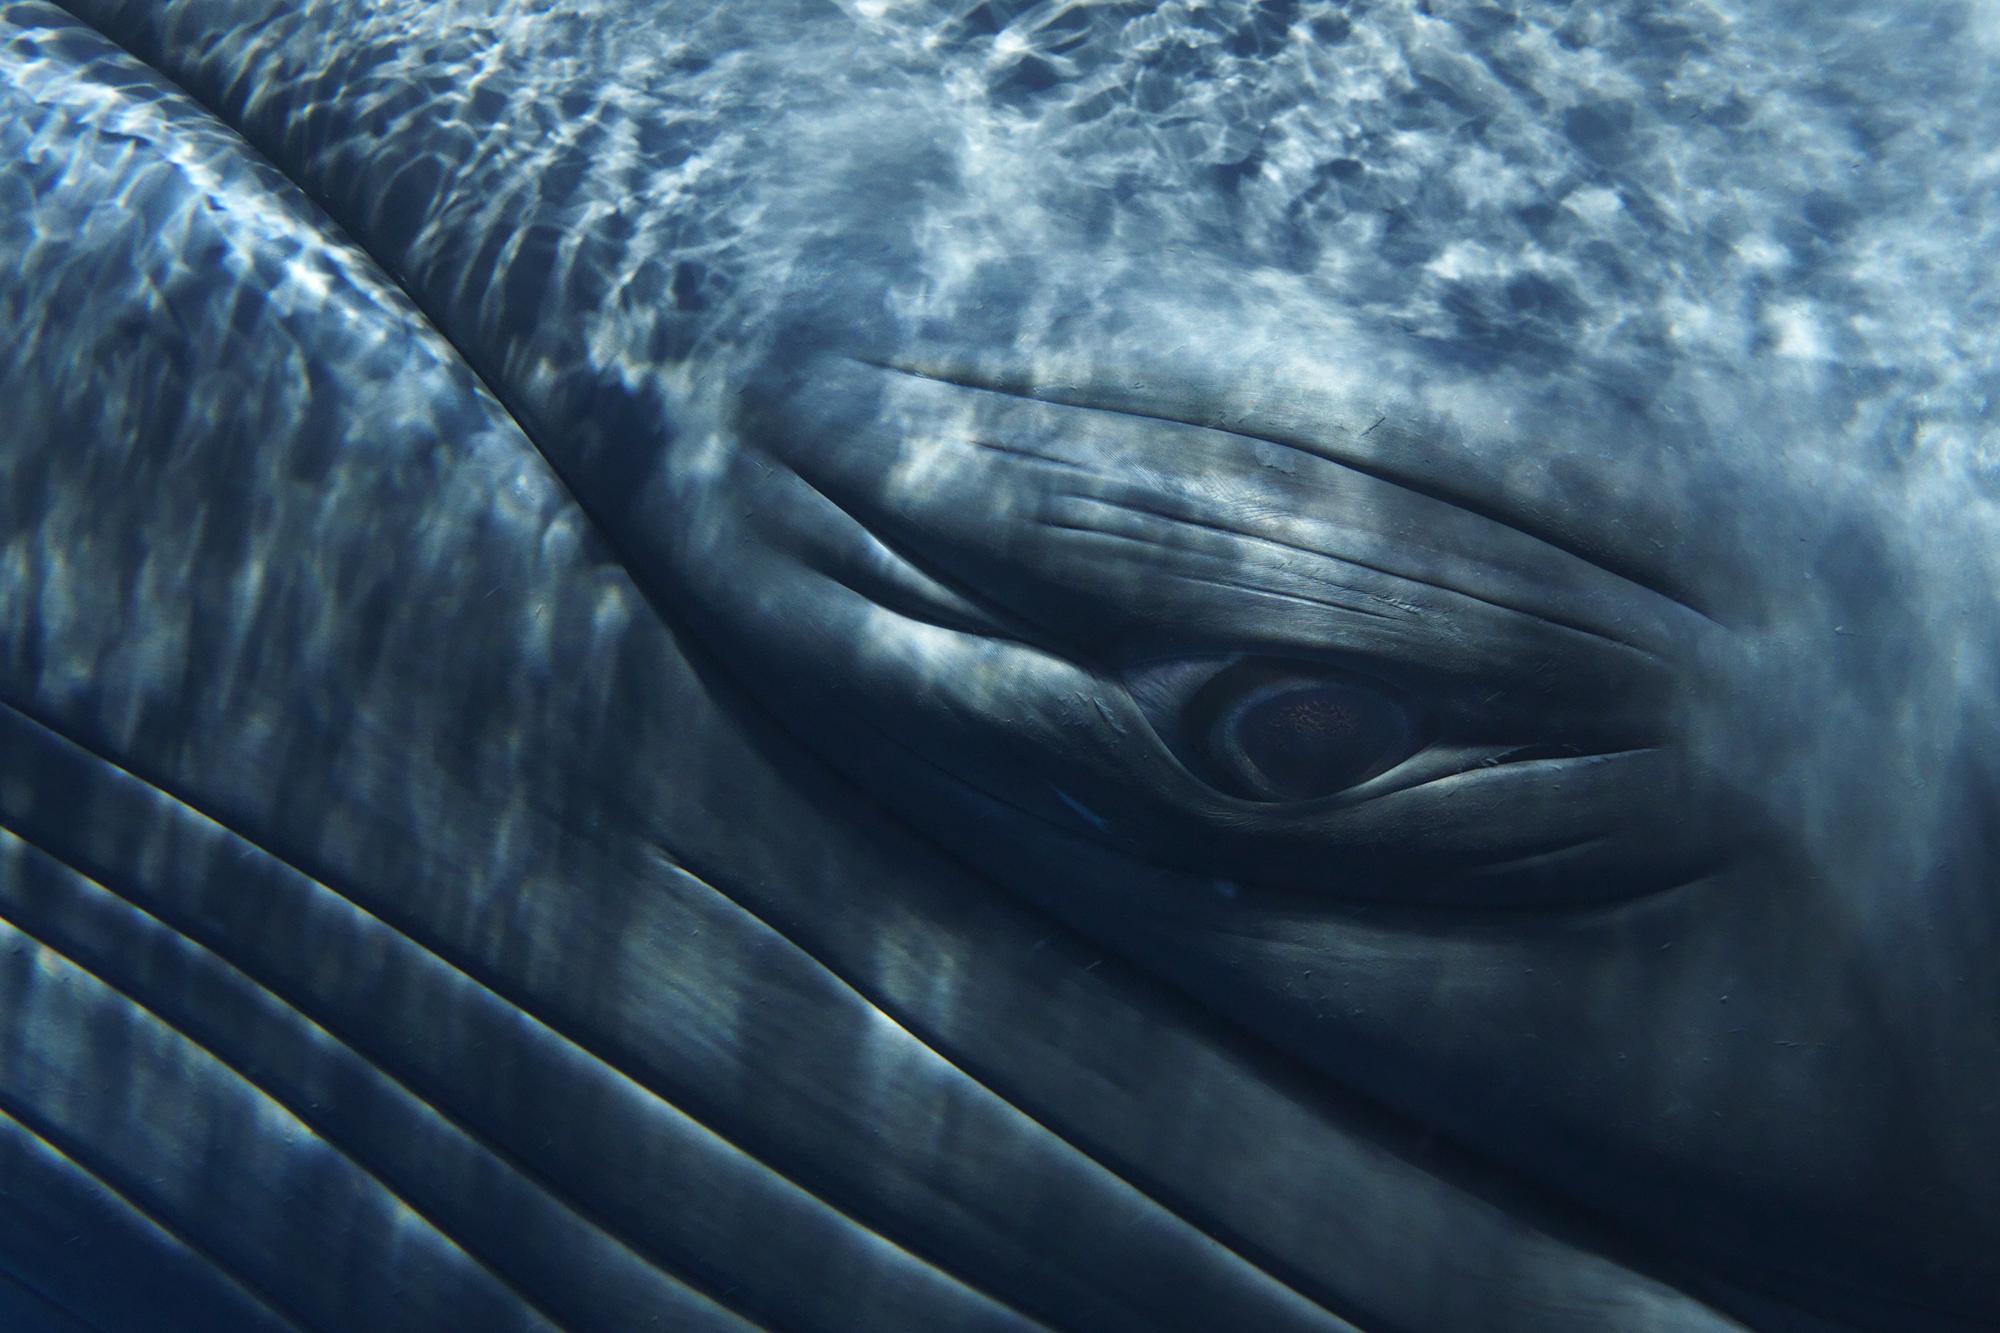 Minke Whale Composite Portrait I - Detail